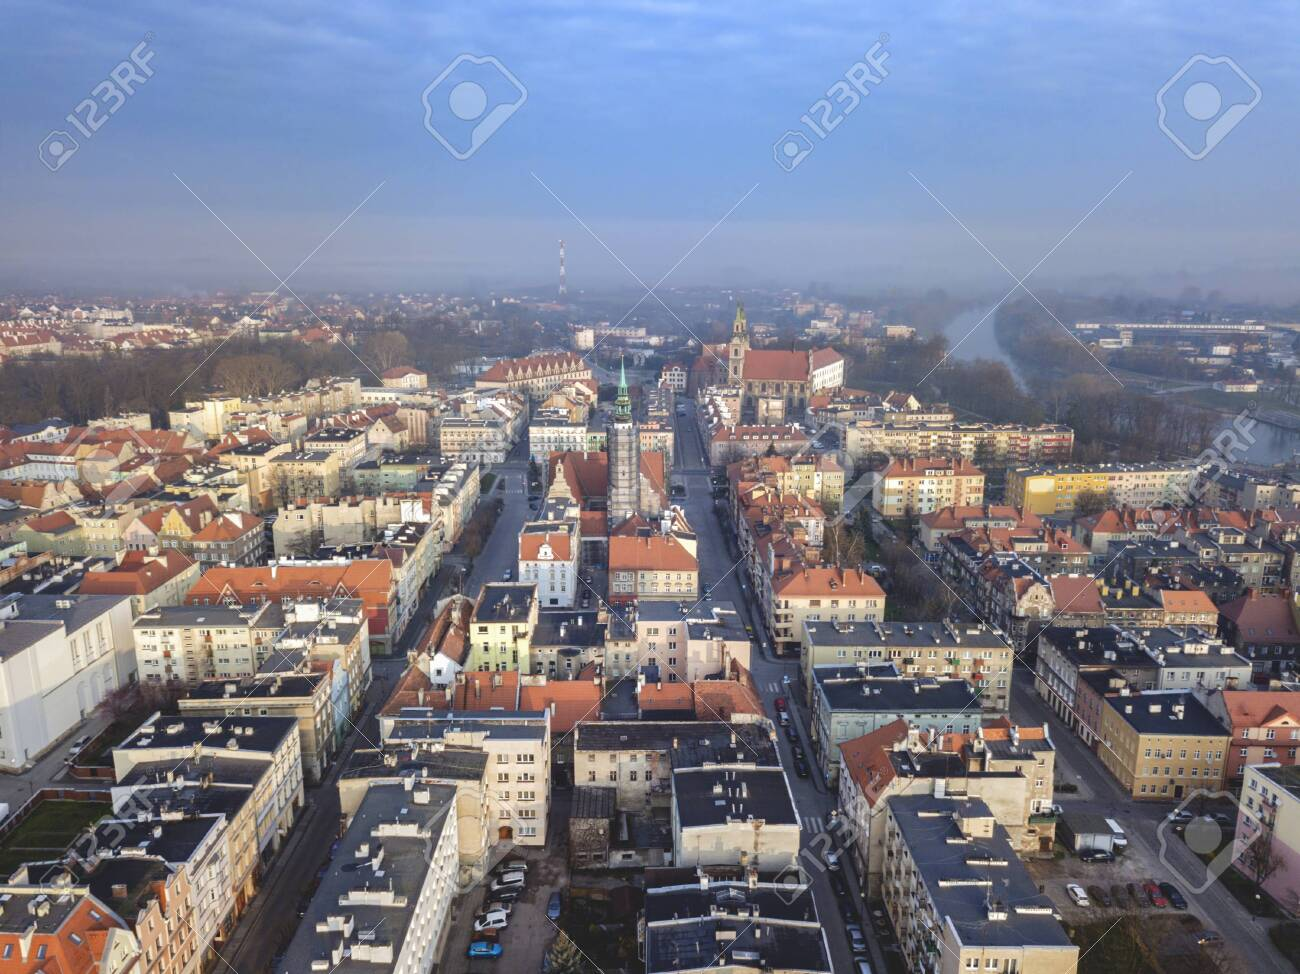 Panorama of Brzeg. Brzeg, Opole, Poland. - 146049359